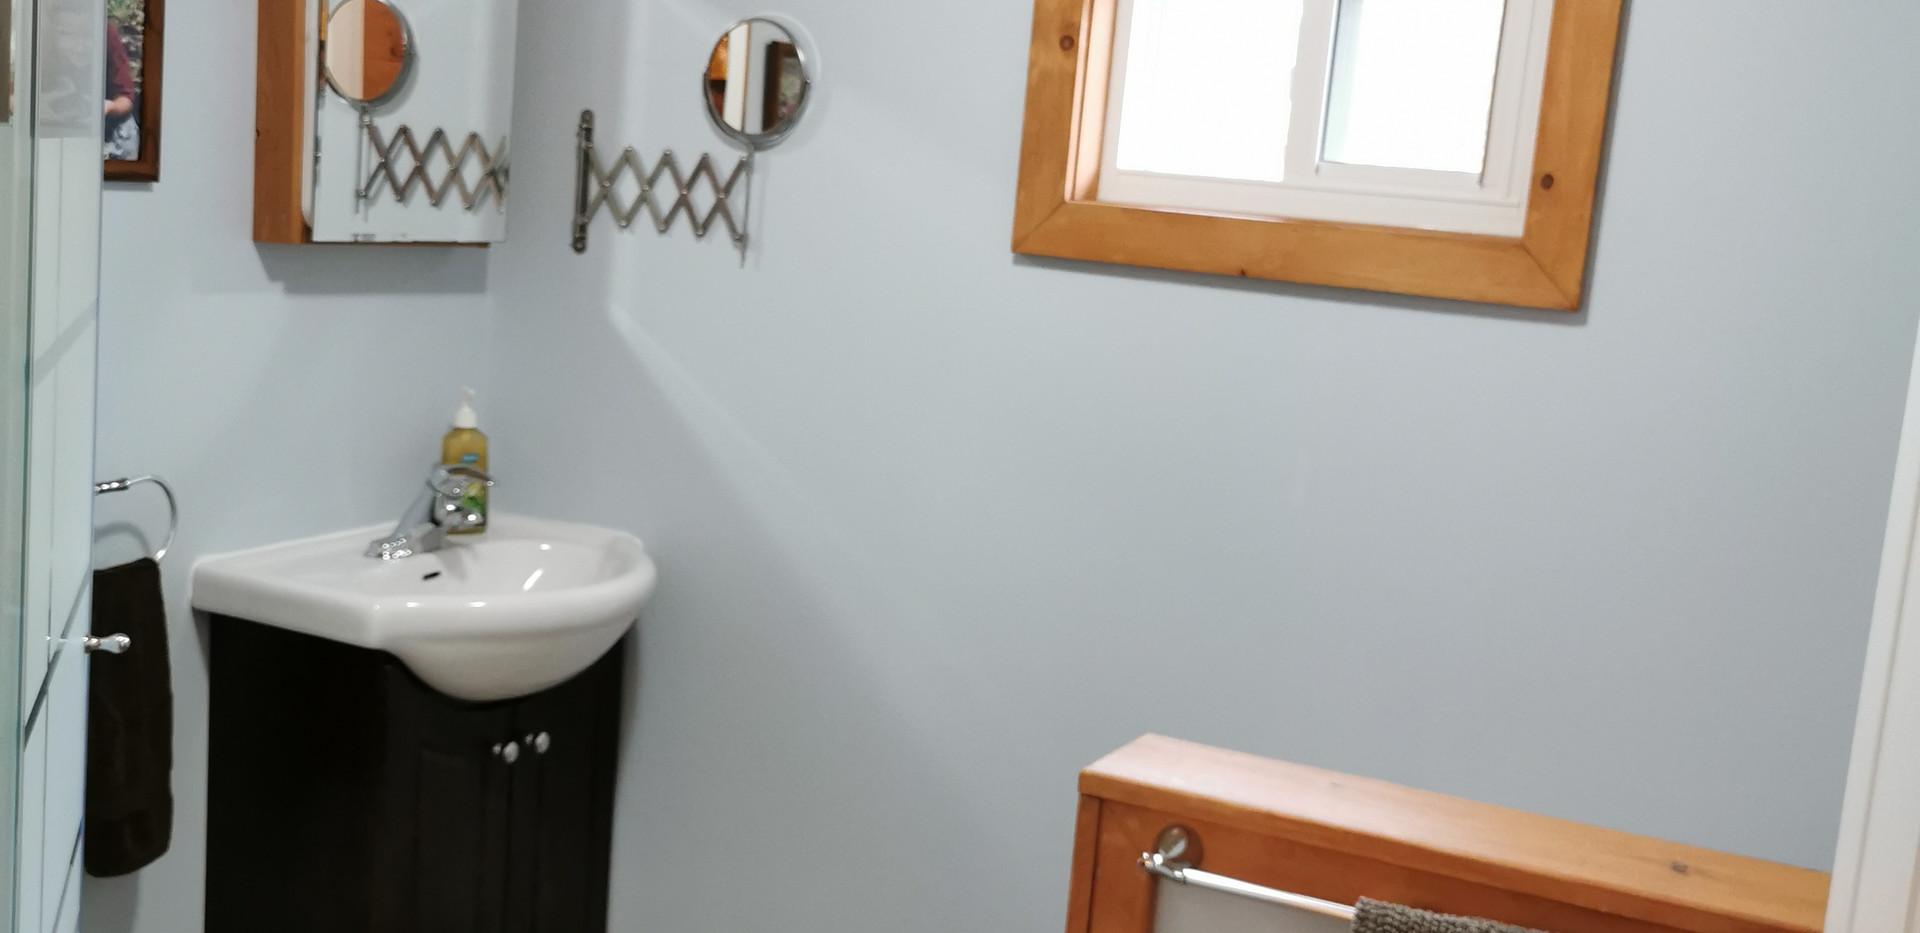 Bathroom, toilet behind part wall